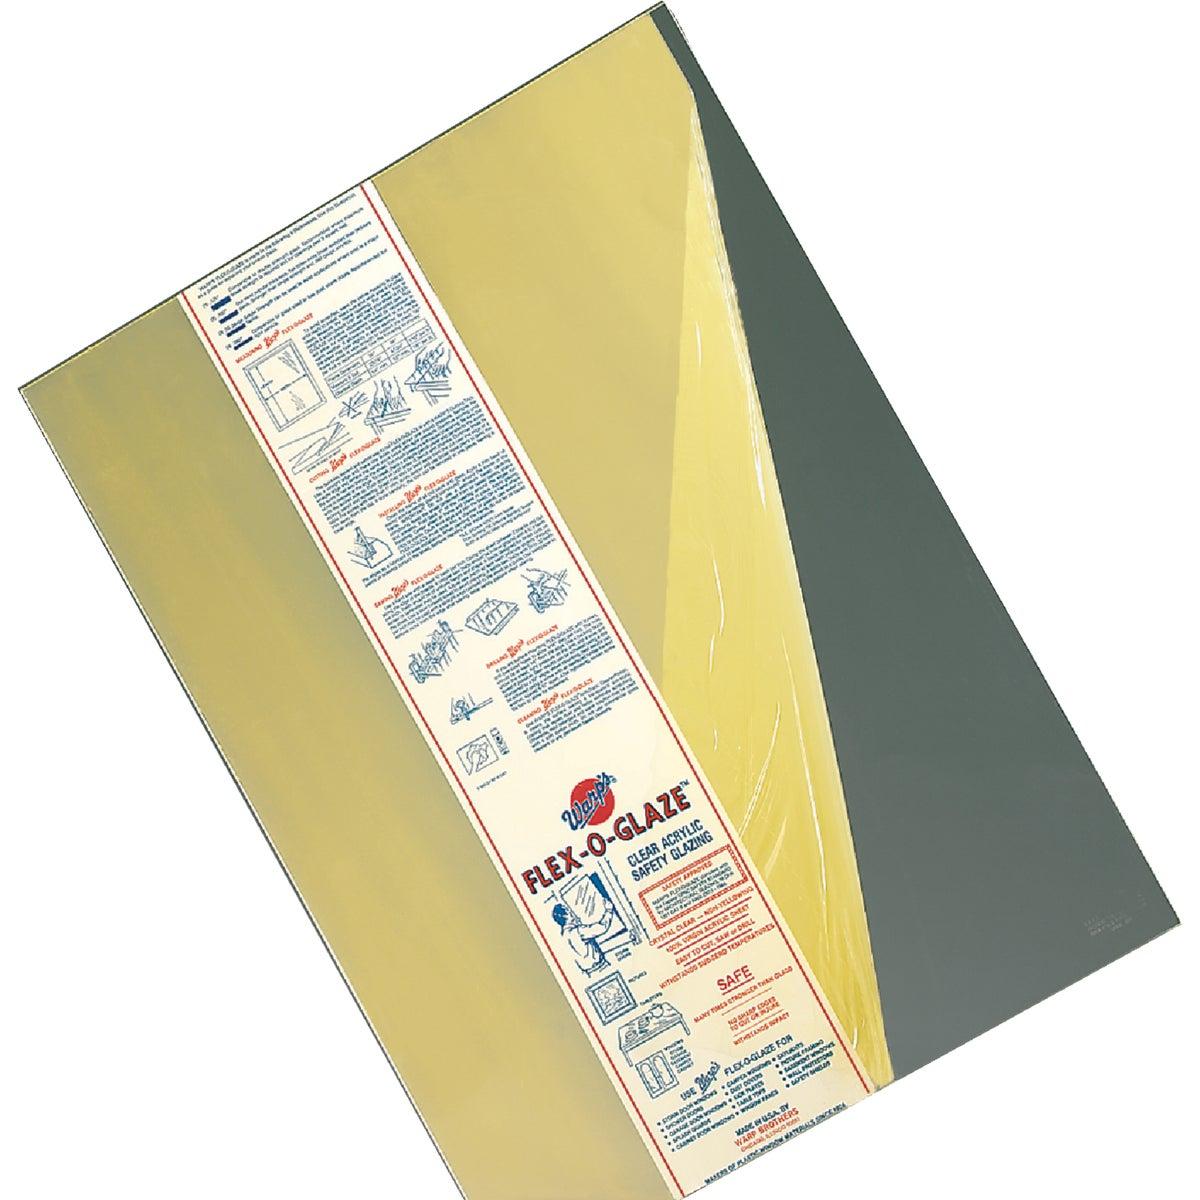 .100 48X96 FLXGL ACRYLIC - 100G-4896 by Warp Bros